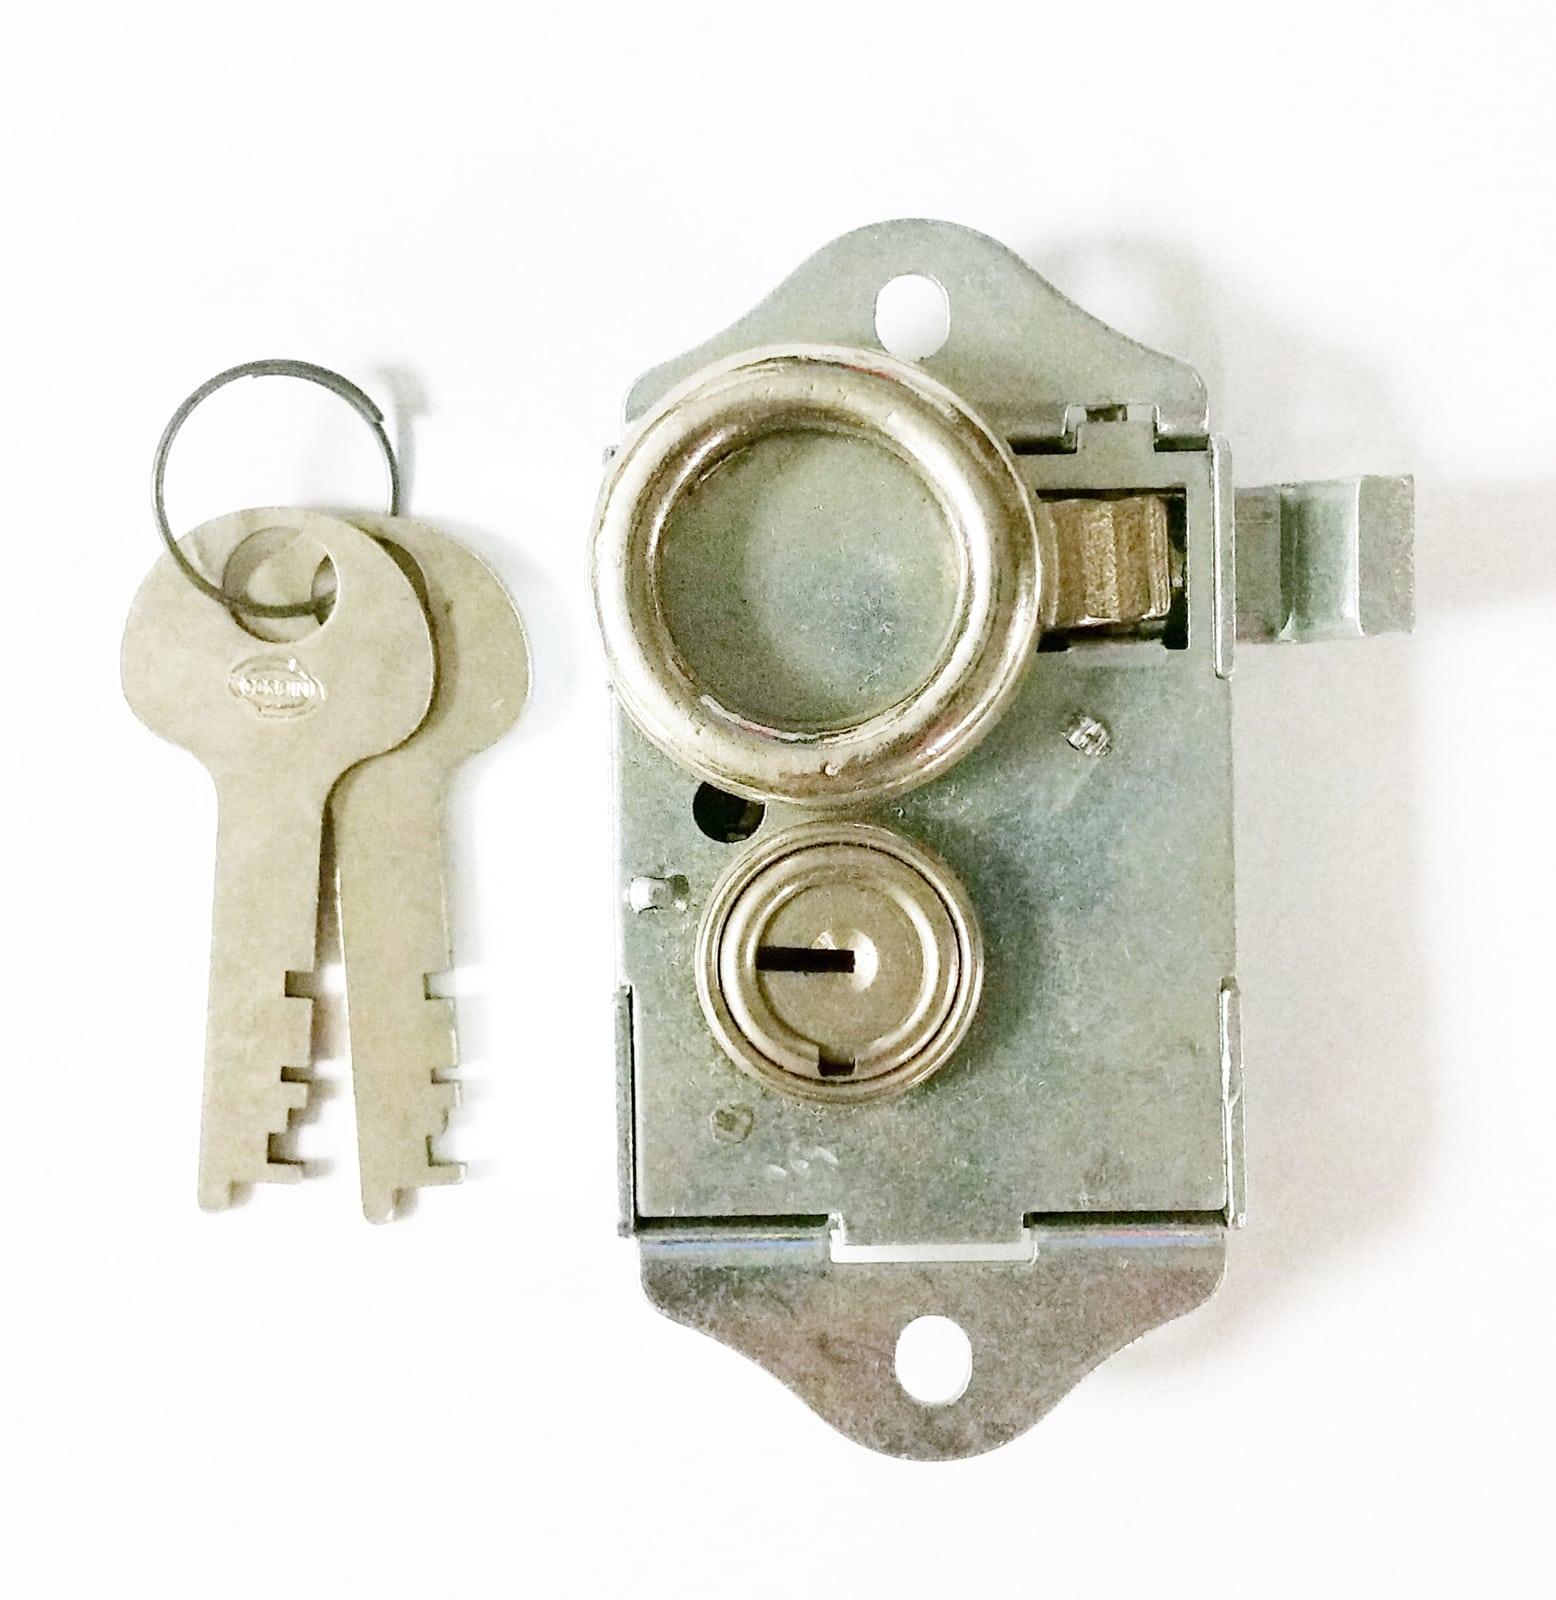 Vintage Corbin Panel Board Lock Flat Steel BNC2 Keyed Alike Locksmith